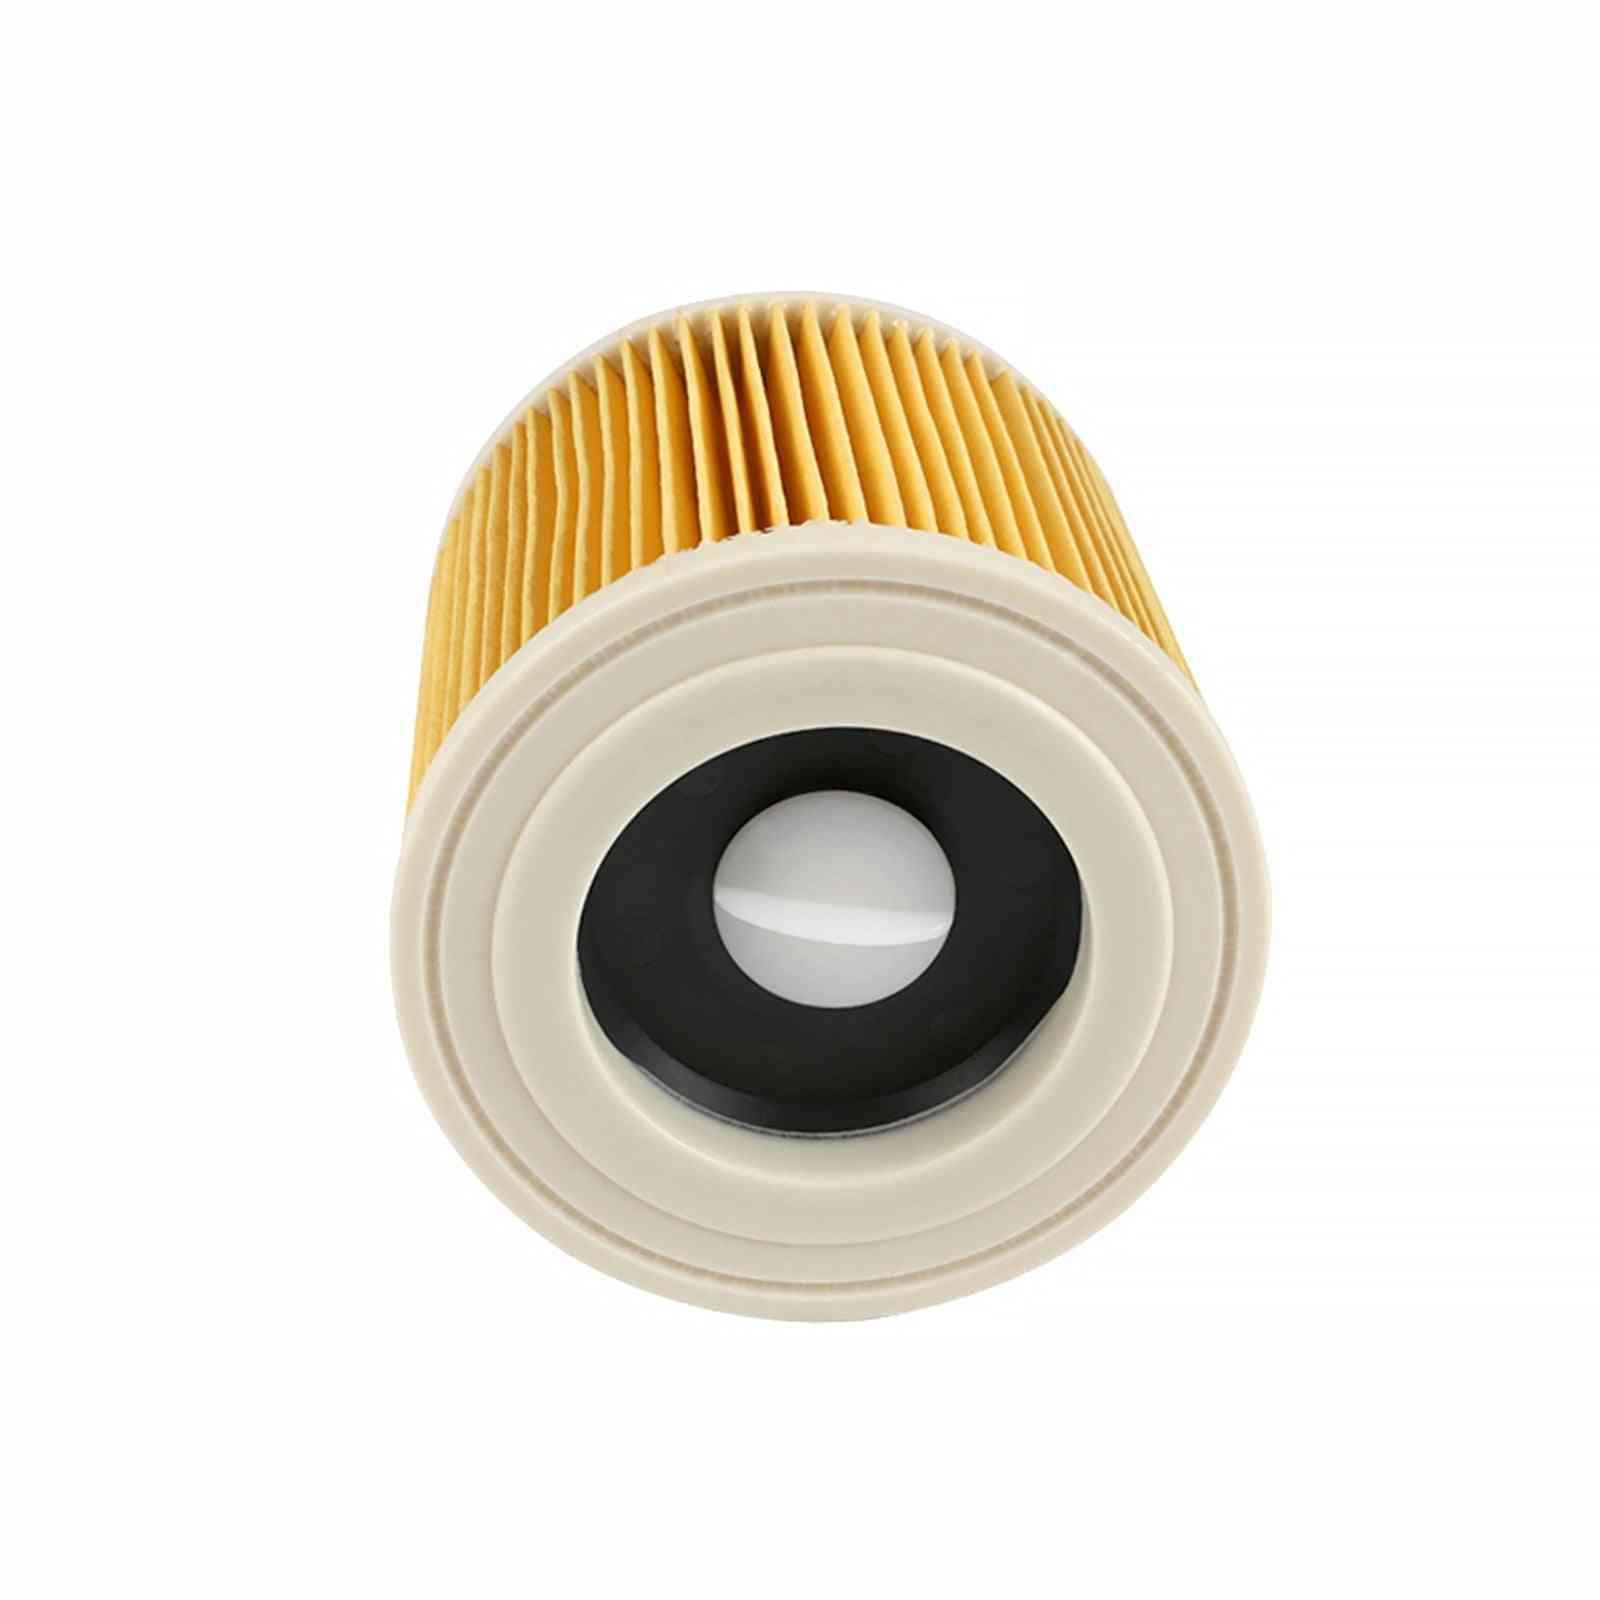 Vacuum Cleaner Cartridge Filter Element, Cartridge Adapts To Element